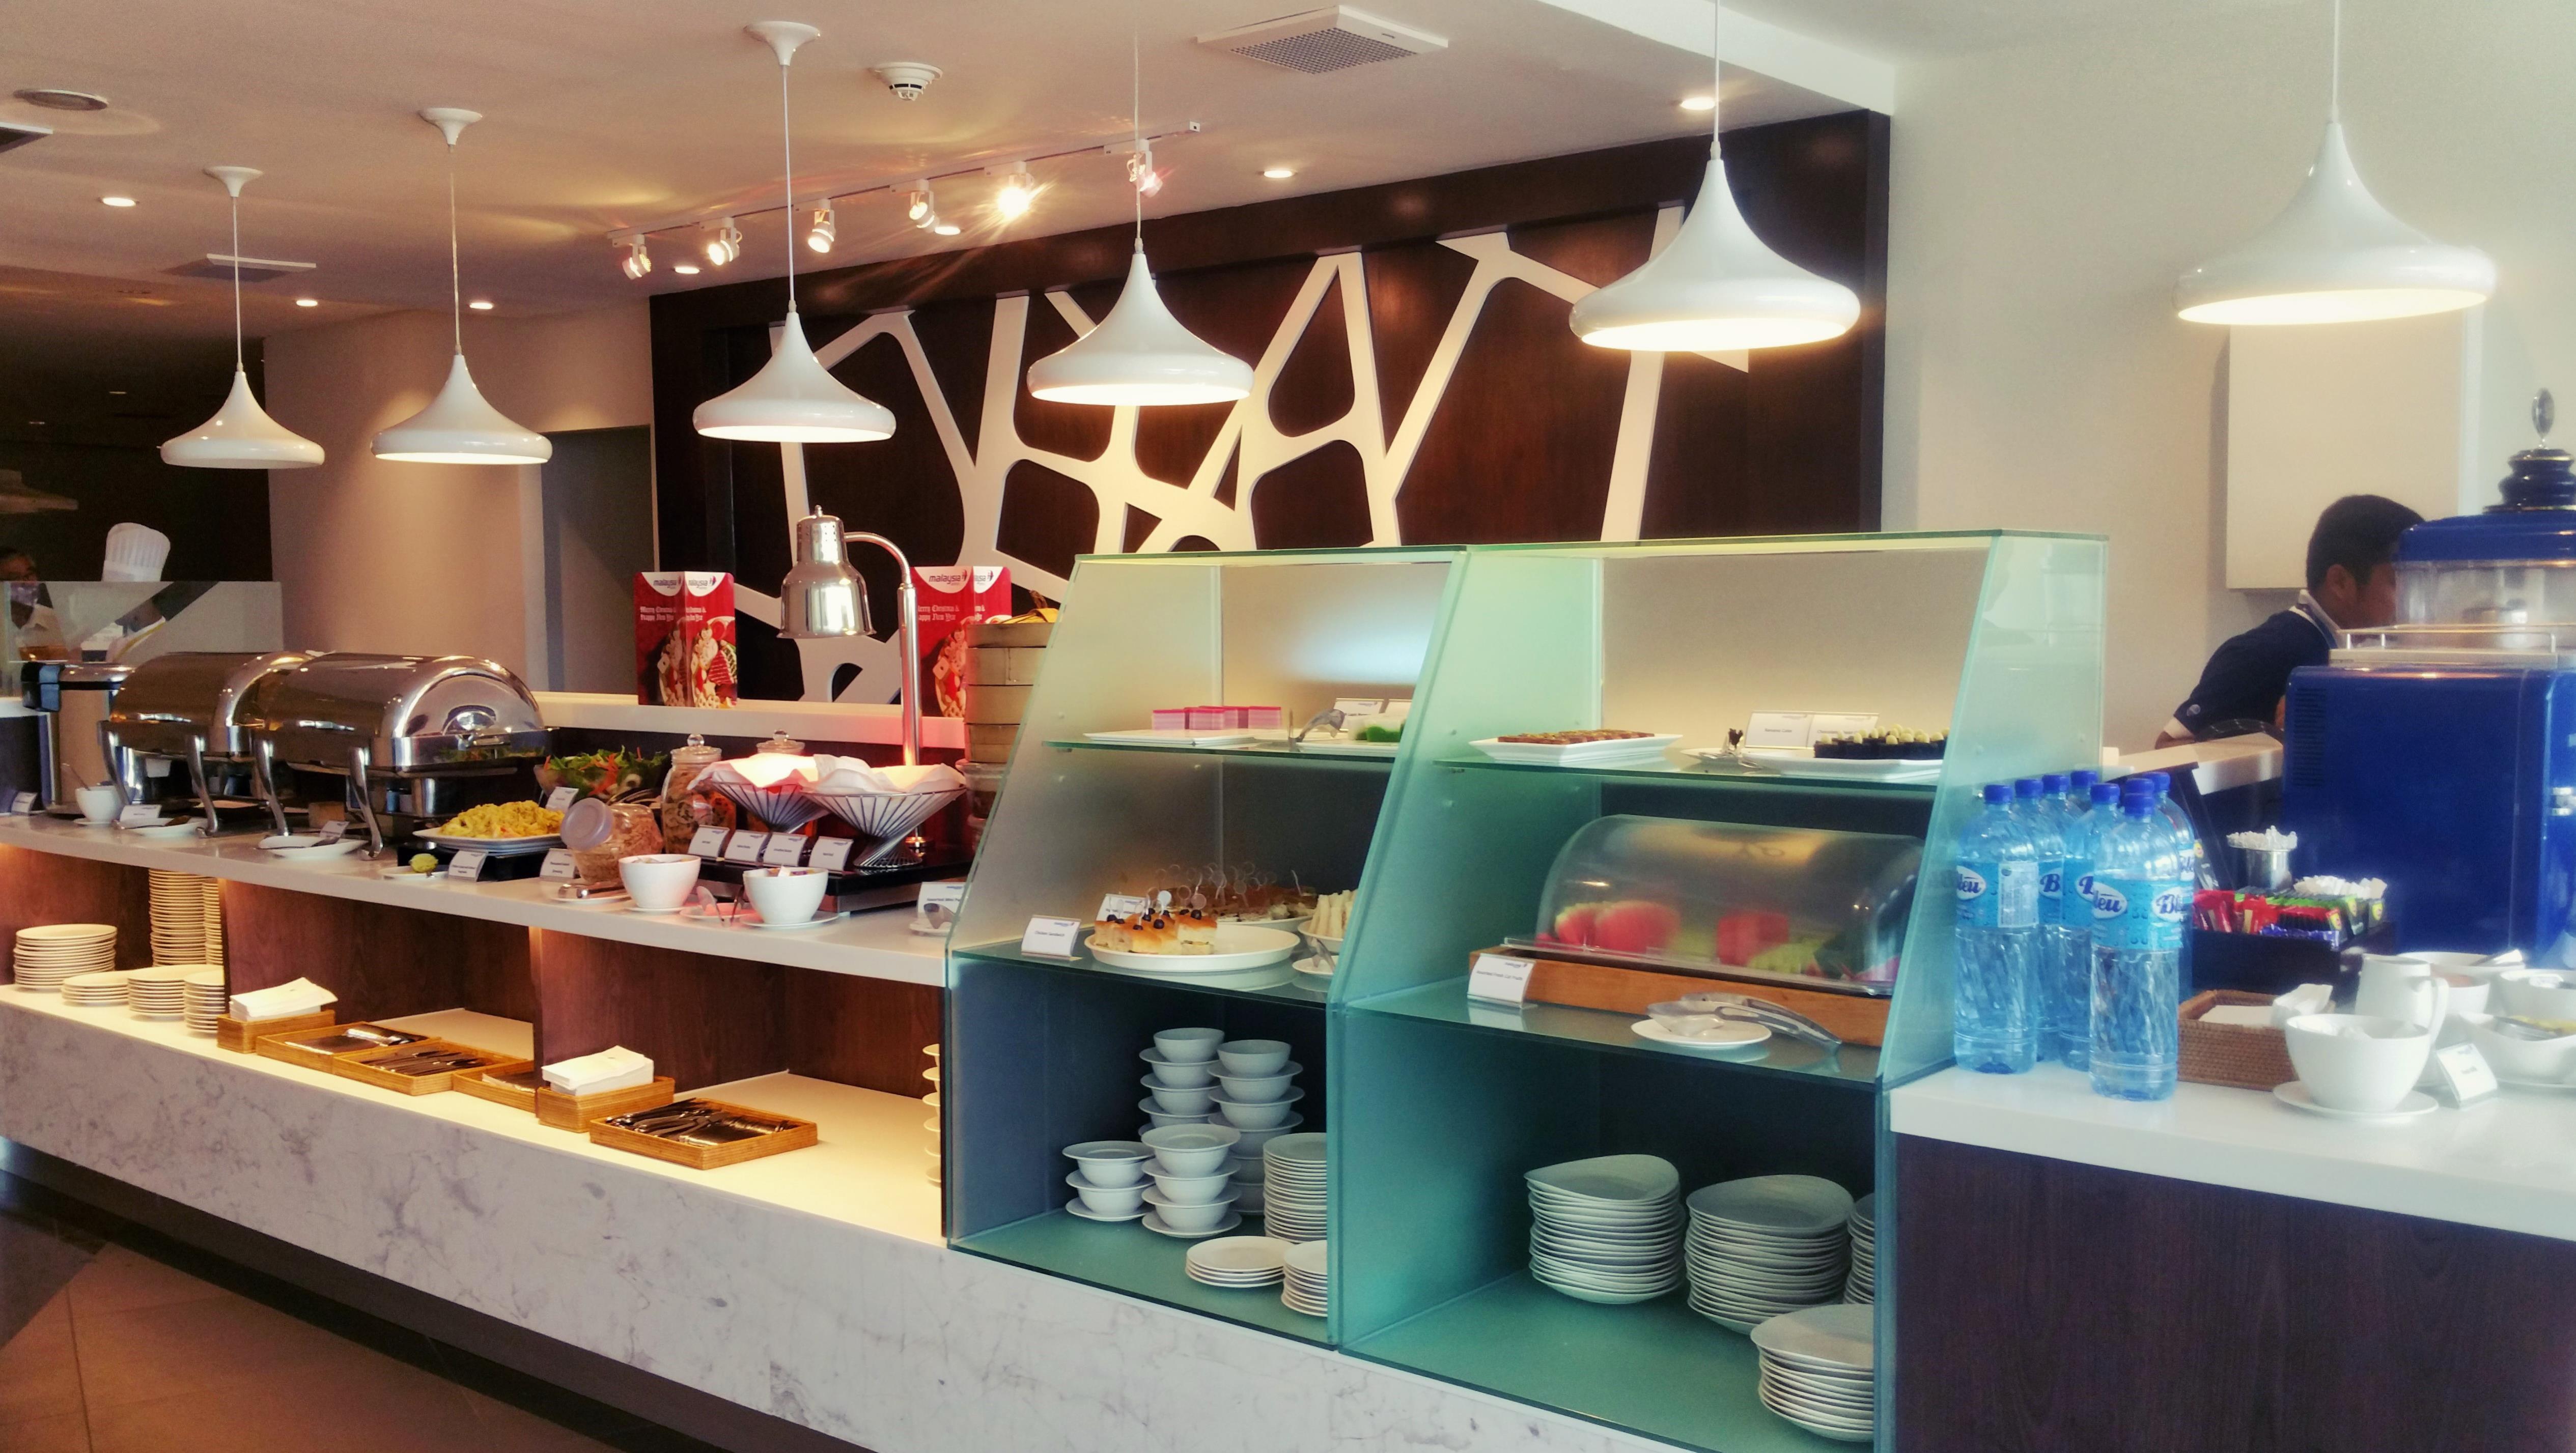 https://multiplyandivide.files.wordpress.com/2015/02/klia_mas-golden-lounge-domestic_buffet-bar.jpg